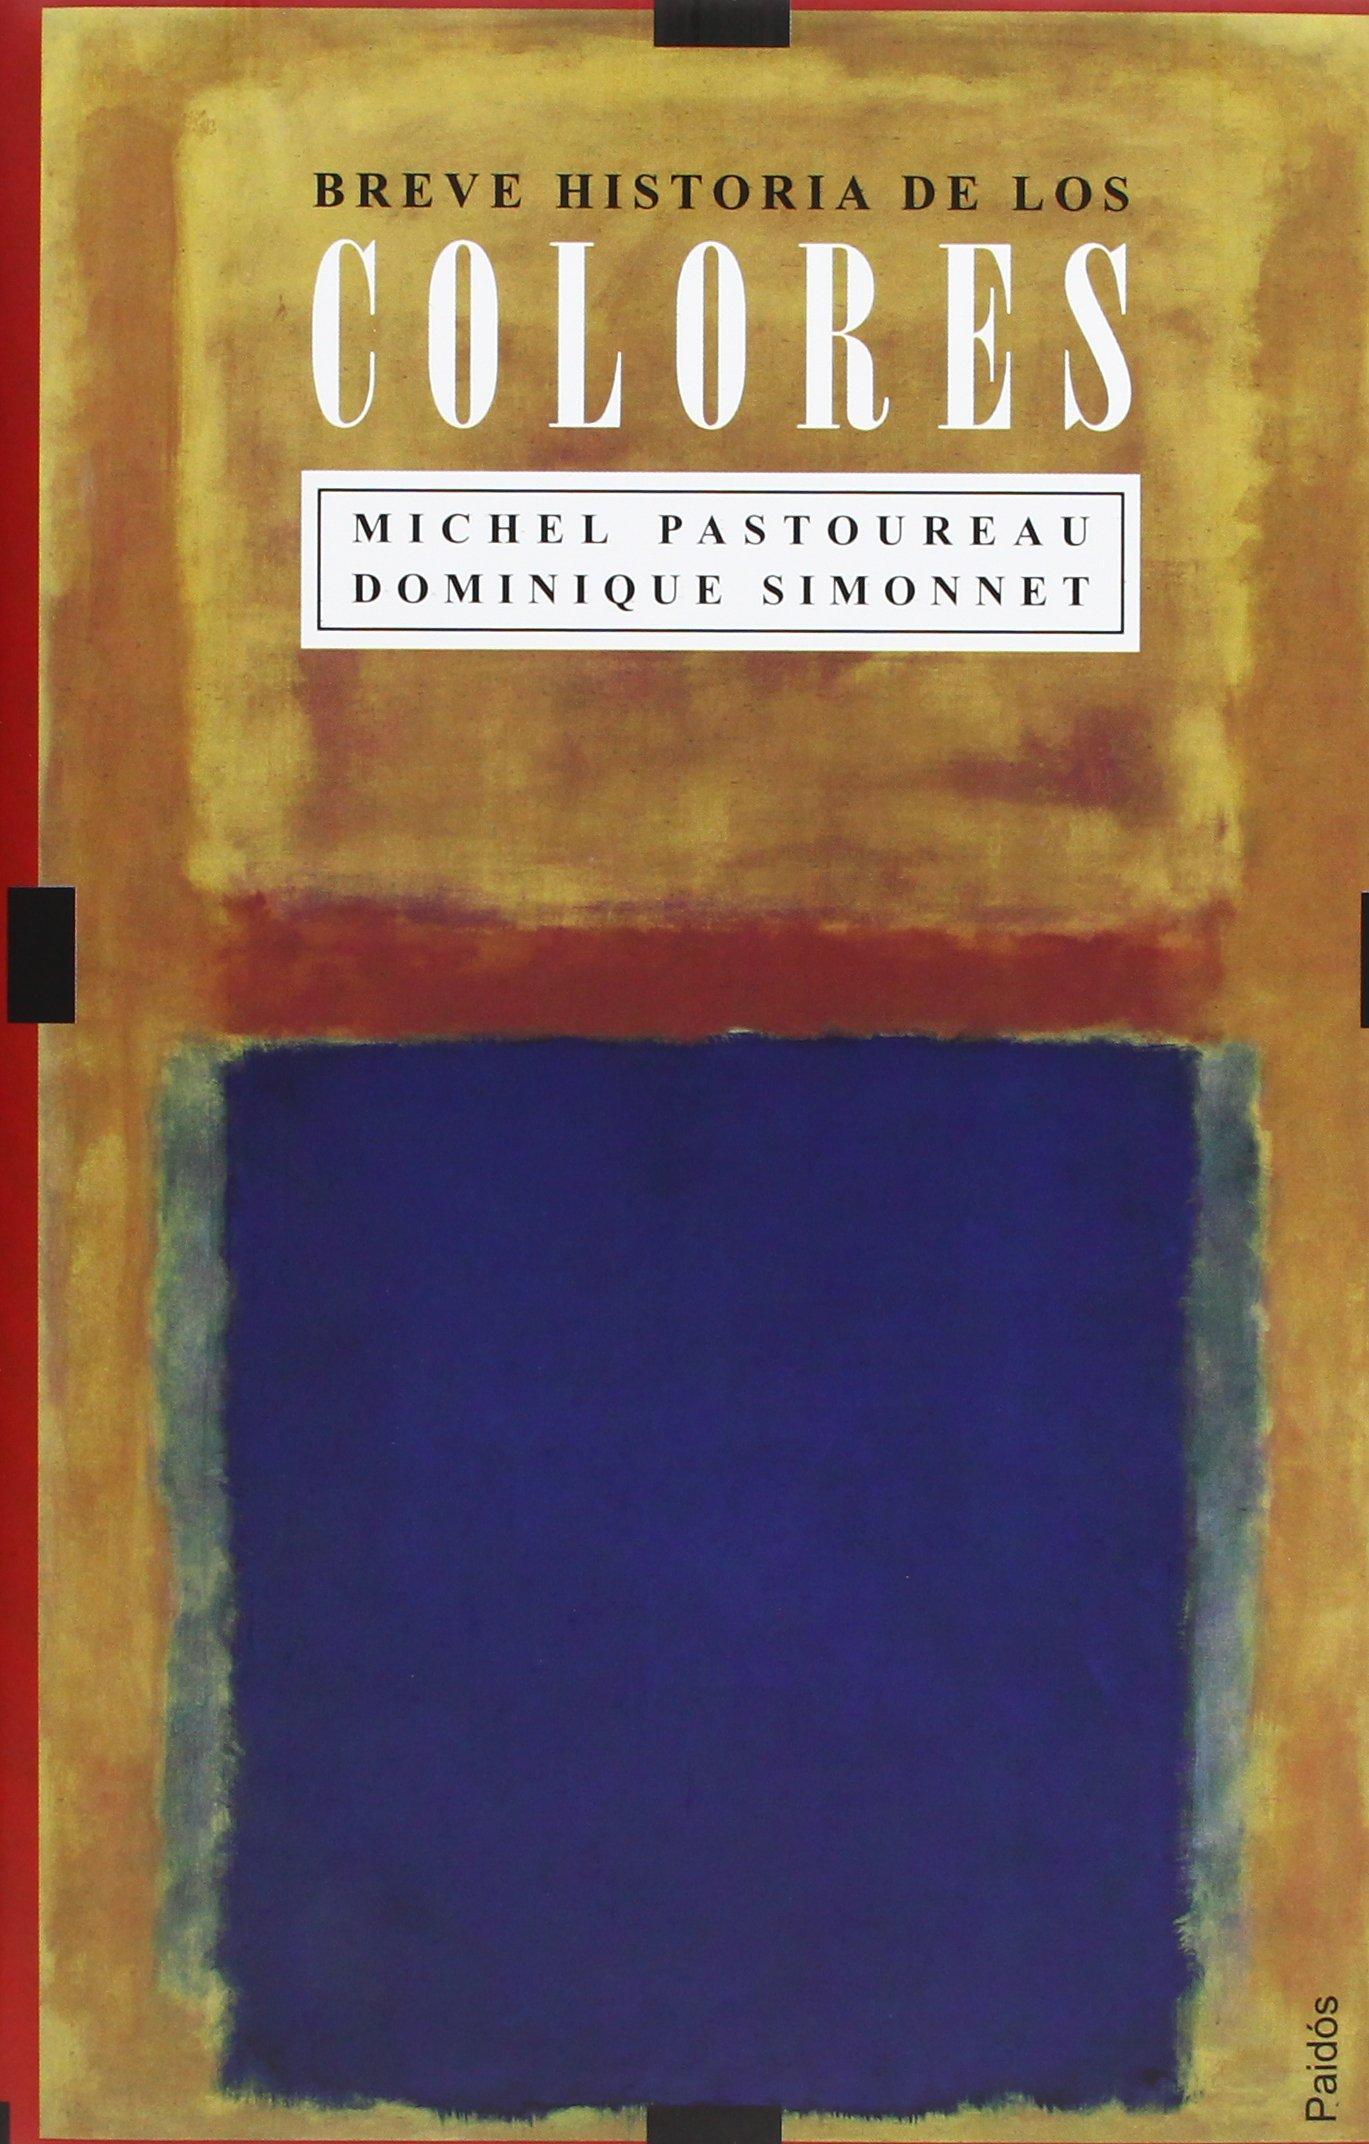 Breve historia de los colores (Libros Singulares): Amazon.es: Pastoureau, Michel, Simonnet, Dominique: Libros